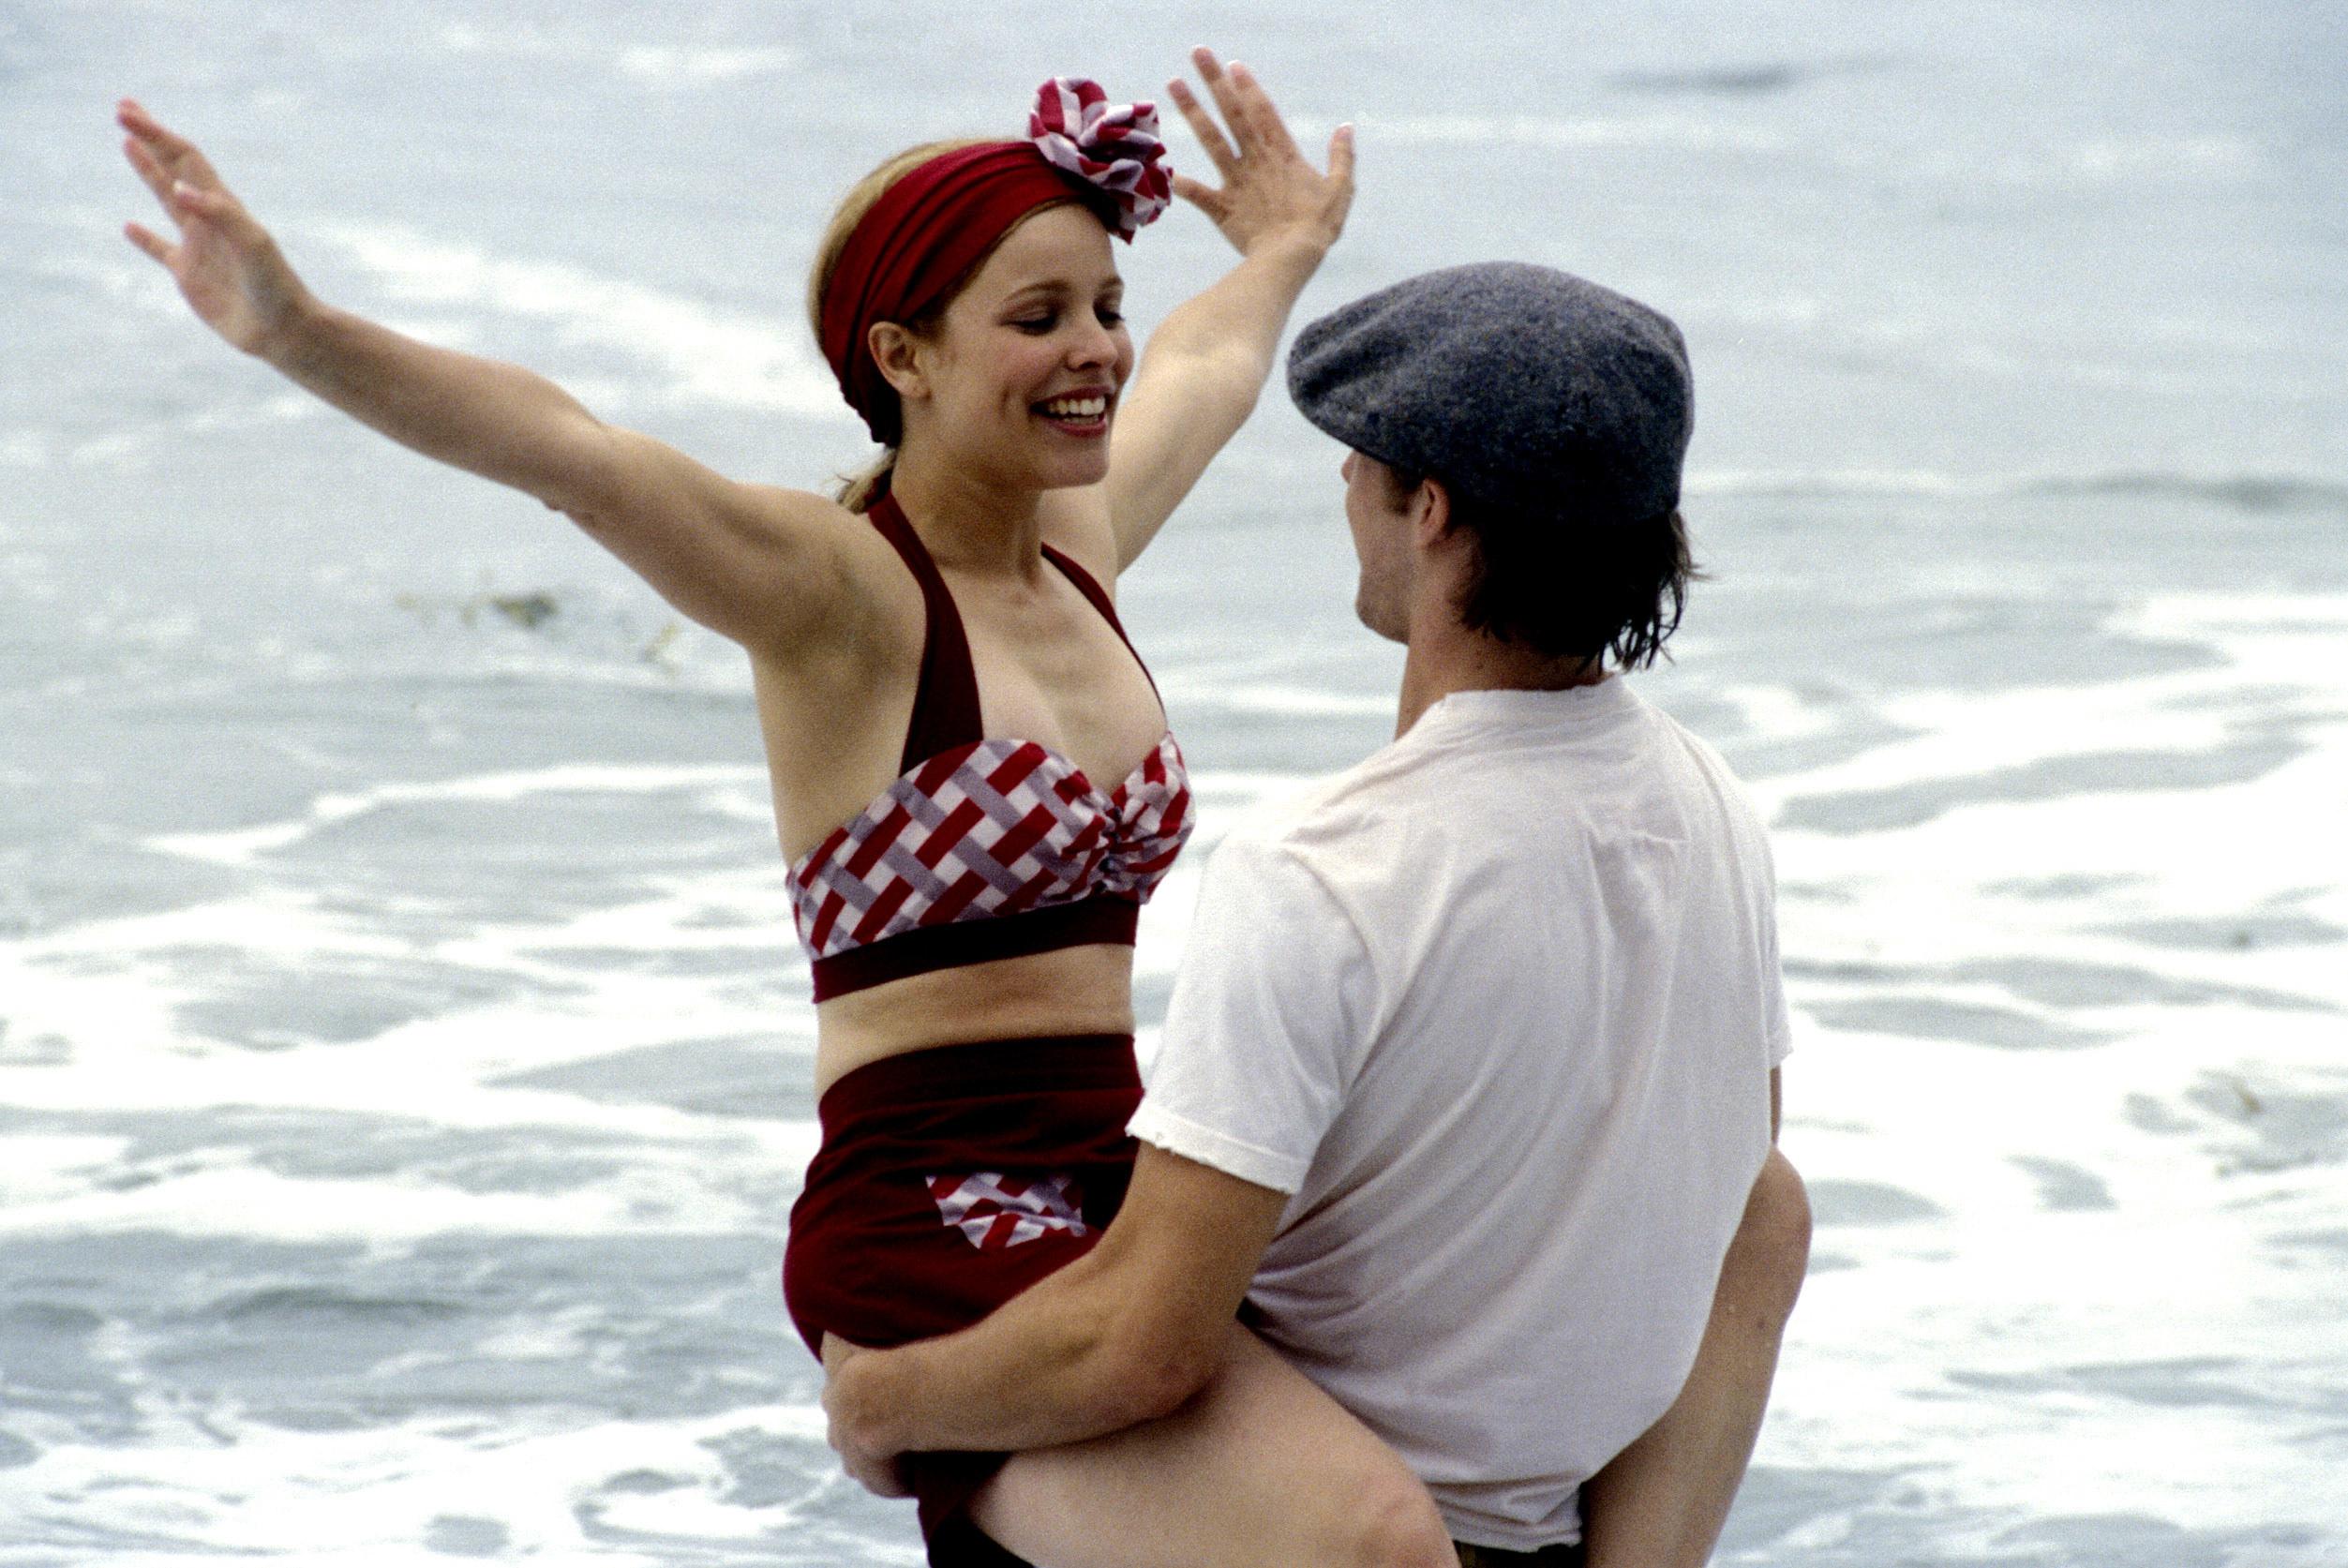 Allie's vintage gingham bikini and Noah's paperboy cap